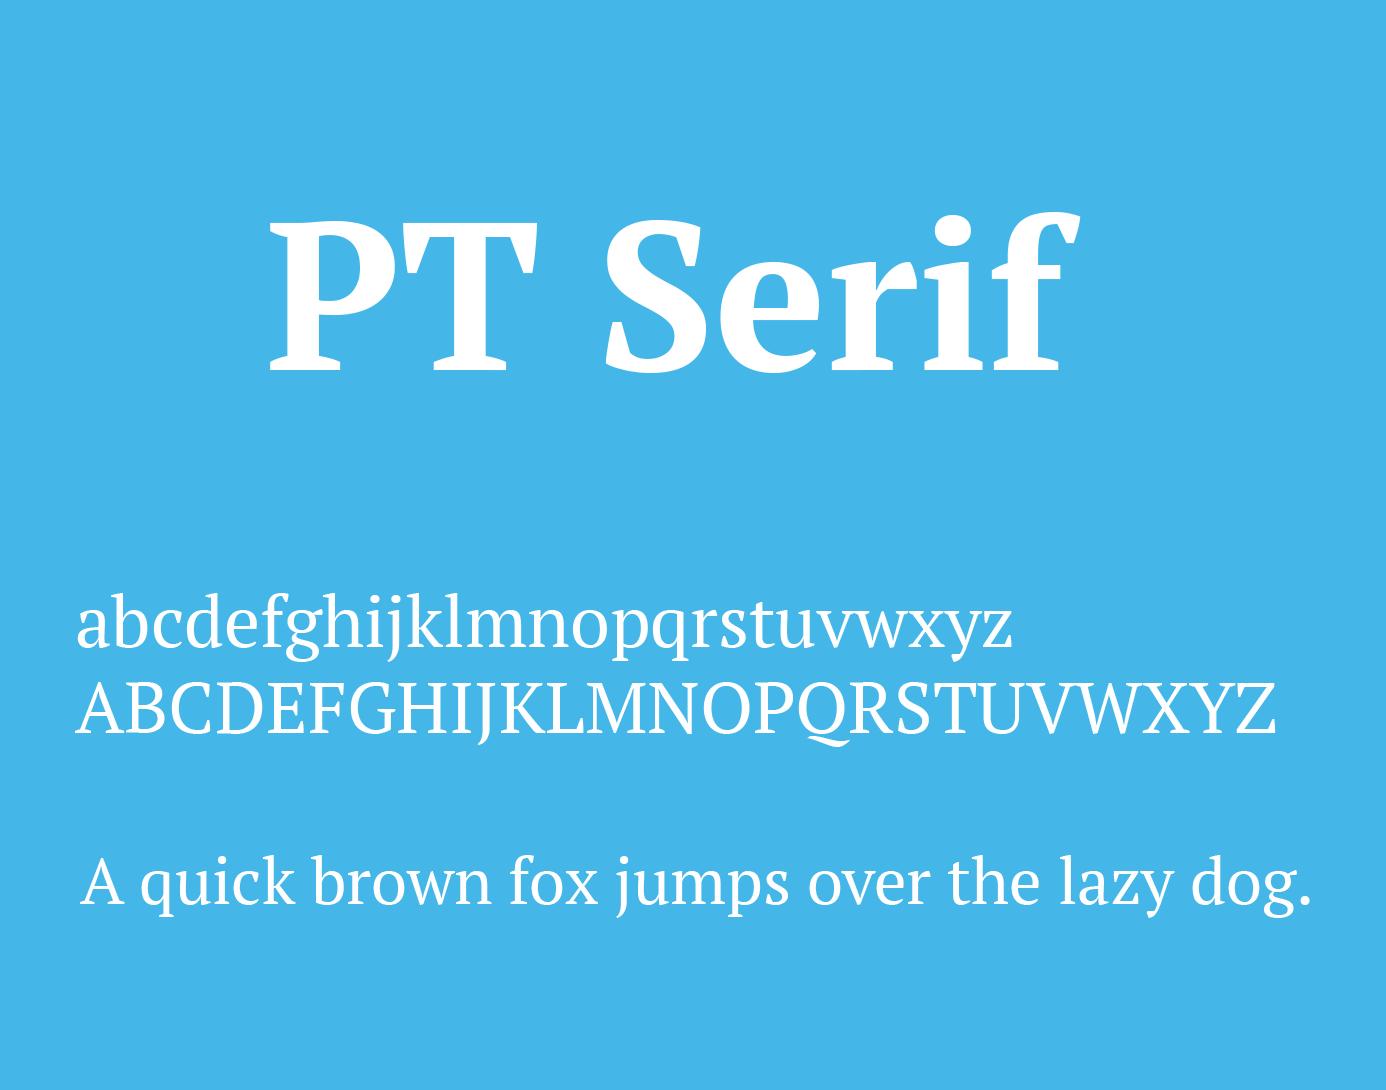 https://fontclarity.com/wp-content/uploads/2019/09/pt-serif-font-download-0.png Free Download